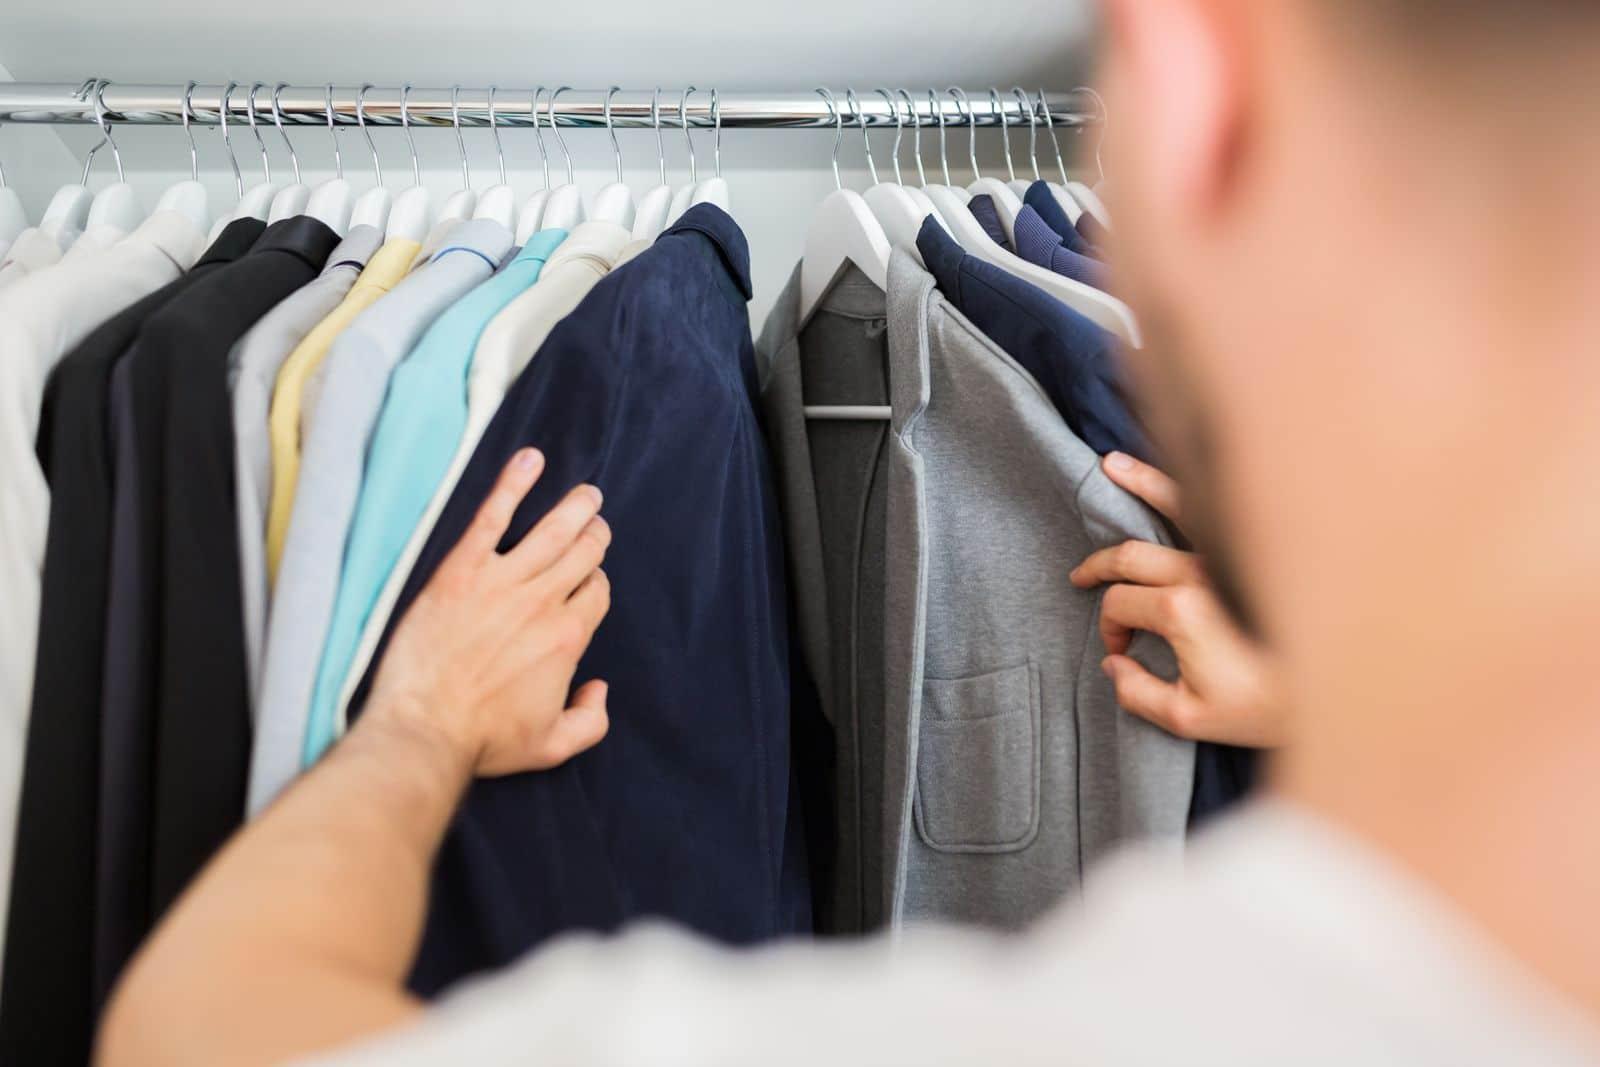 Man looking through his clothes